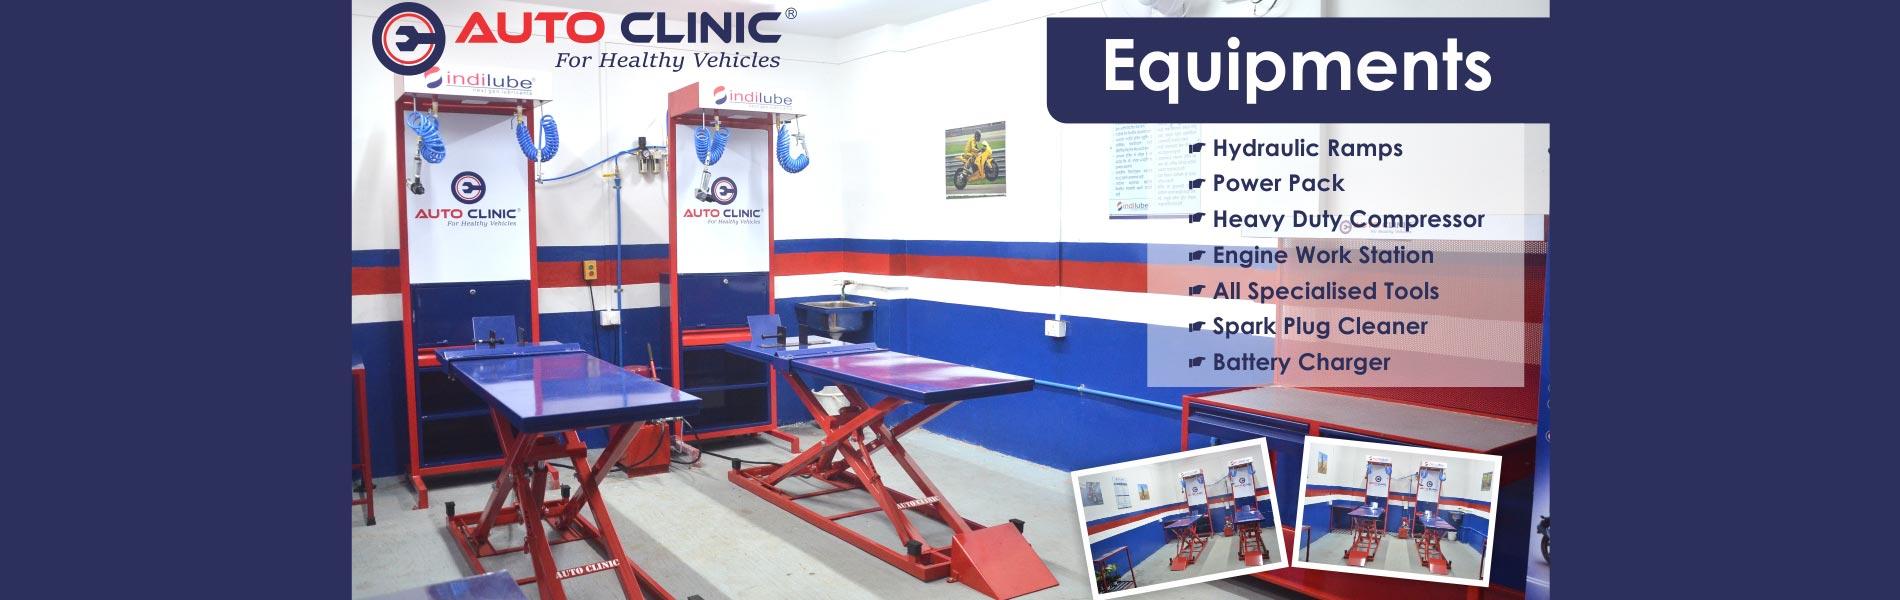 Indilube Auto Clinic